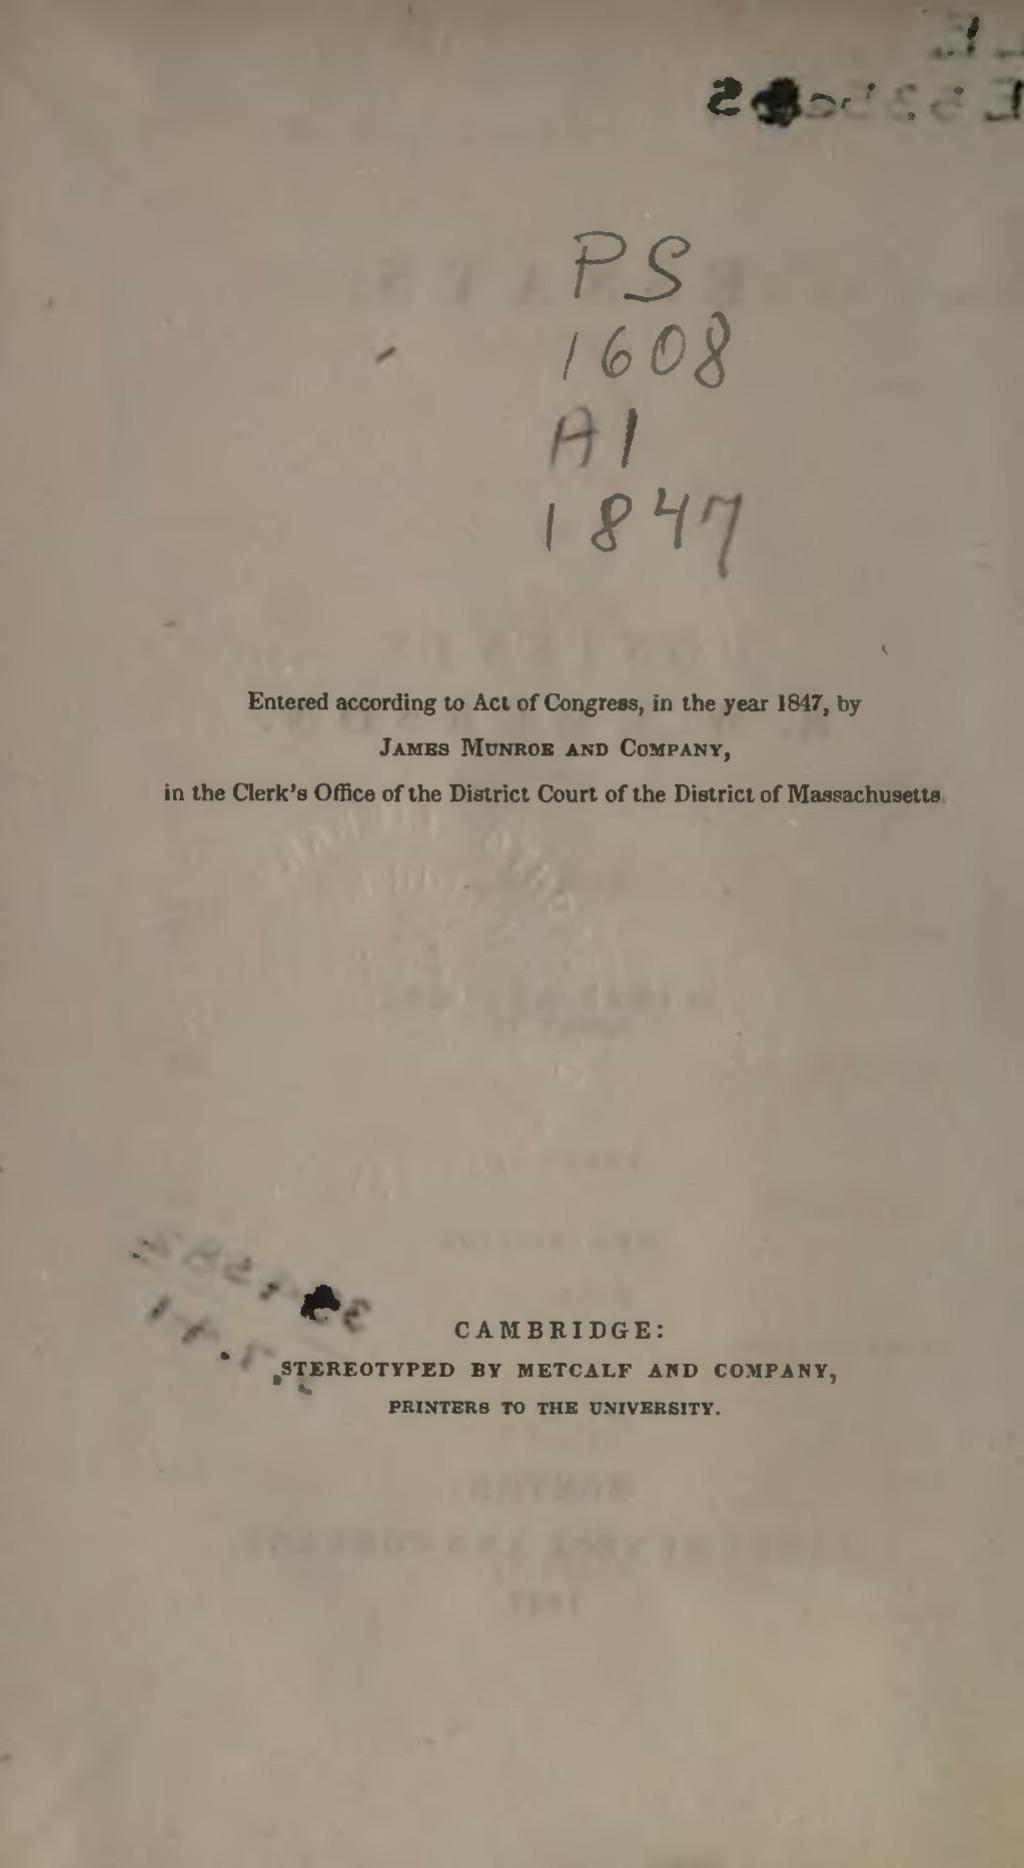 014 Essays First Series Page10 1024px Essays2c 28184729 Djvu Essay Stunning Emerson Pdf Shelburne Publisher Large